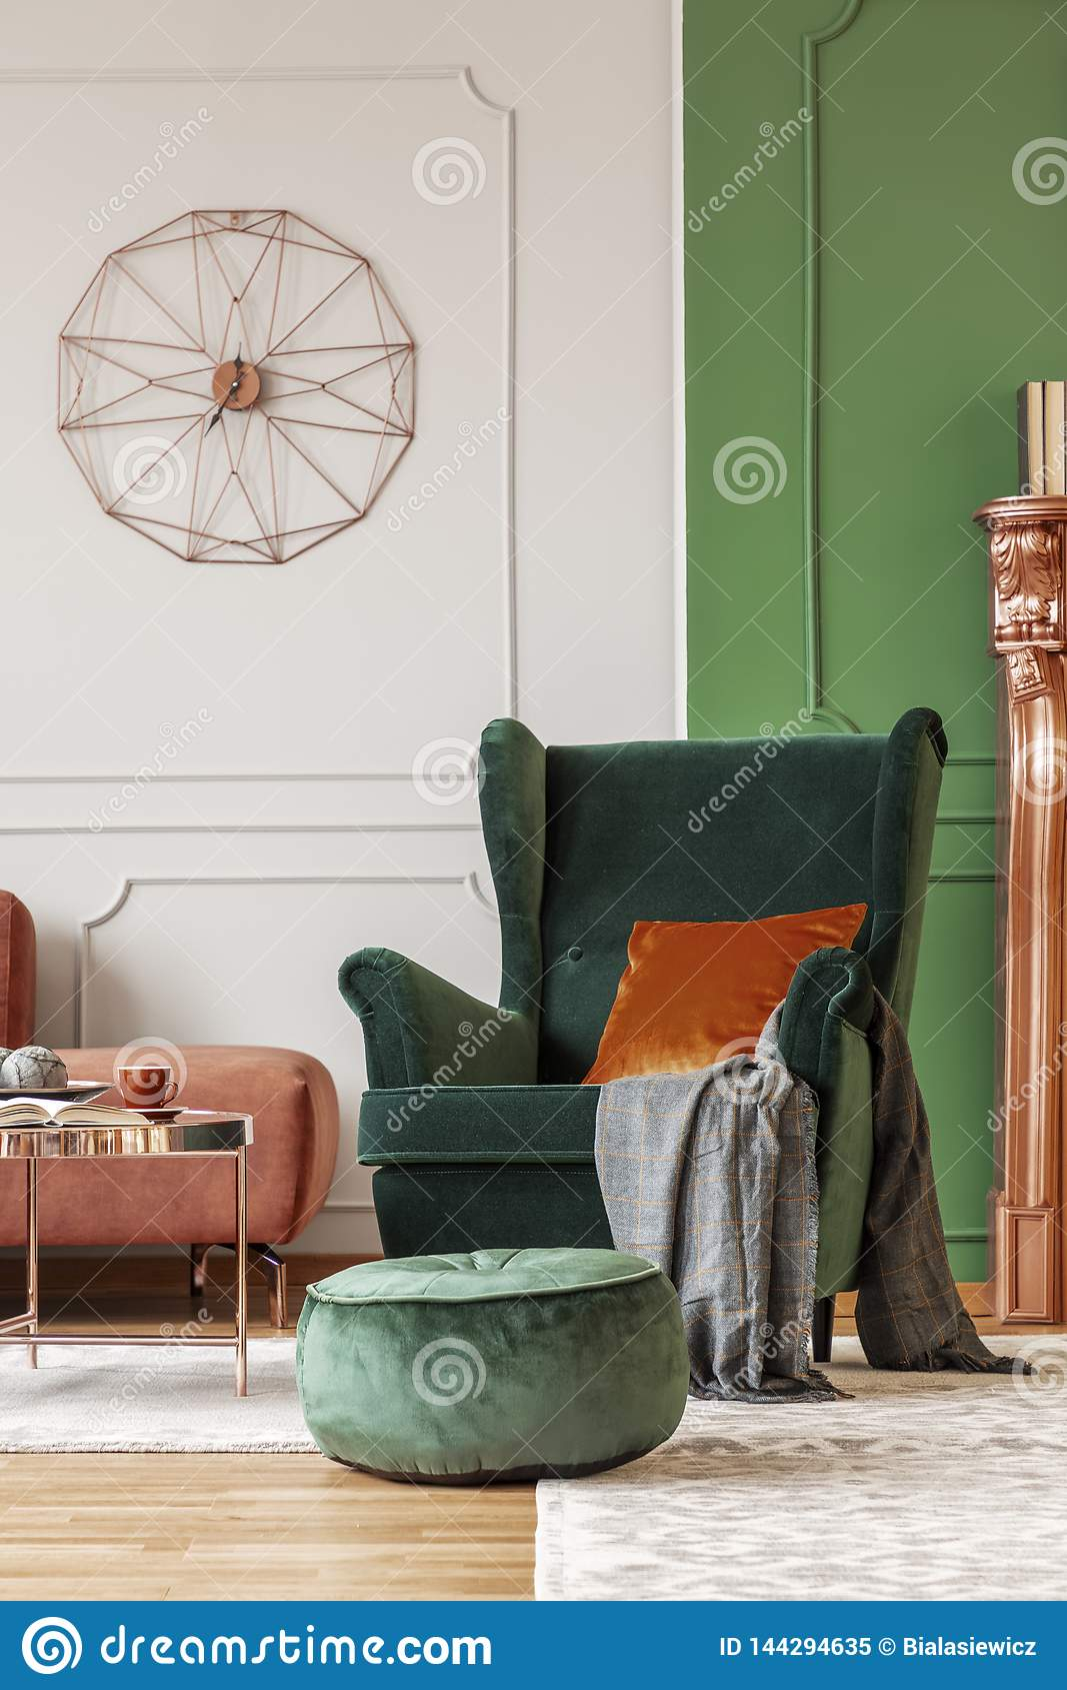 Stupendous Elegant Green Armchair With Dark Orange Pillow Stock Image Spiritservingveterans Wood Chair Design Ideas Spiritservingveteransorg